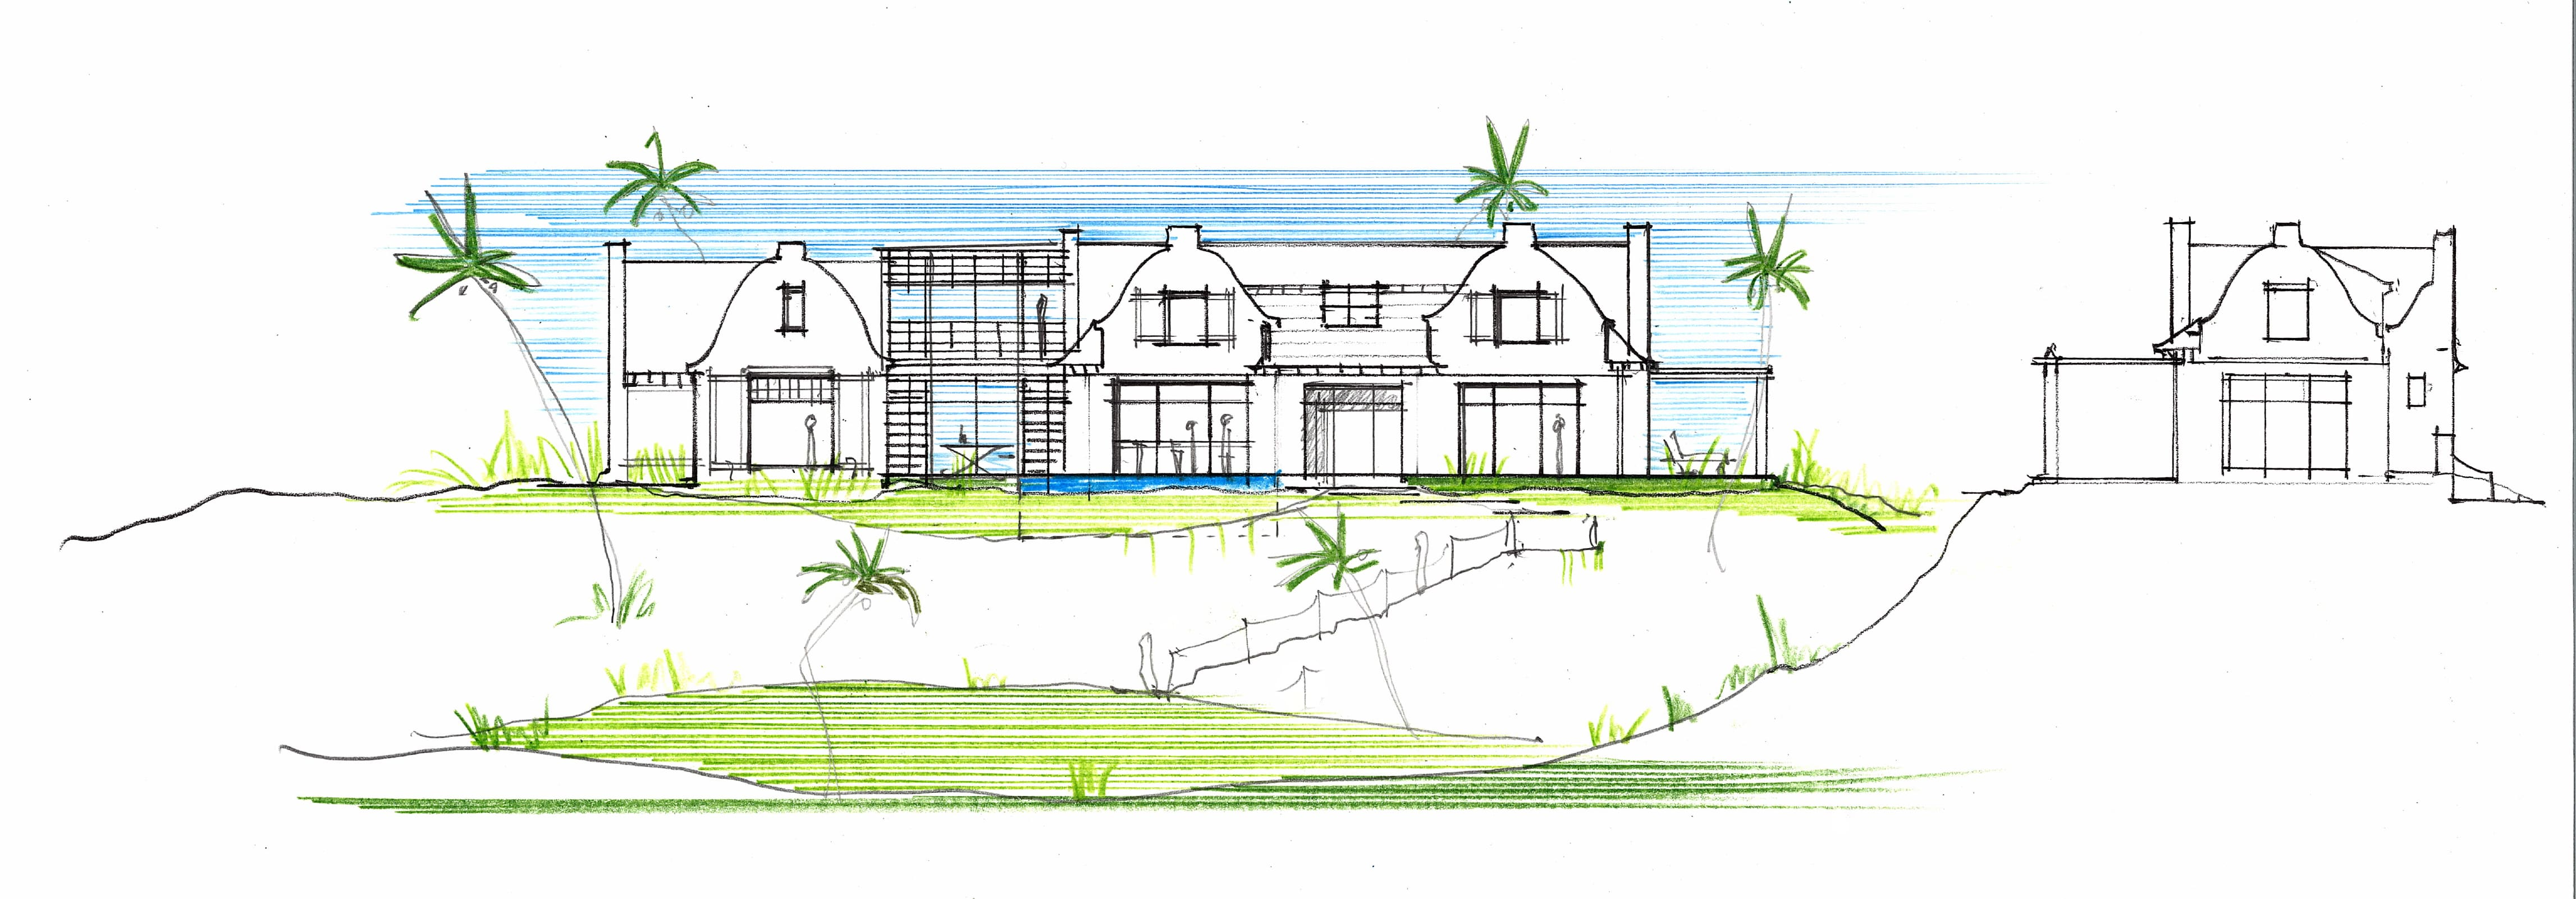 1. Concept 2_Scotts Sketches_Elevations.pdf-1-min